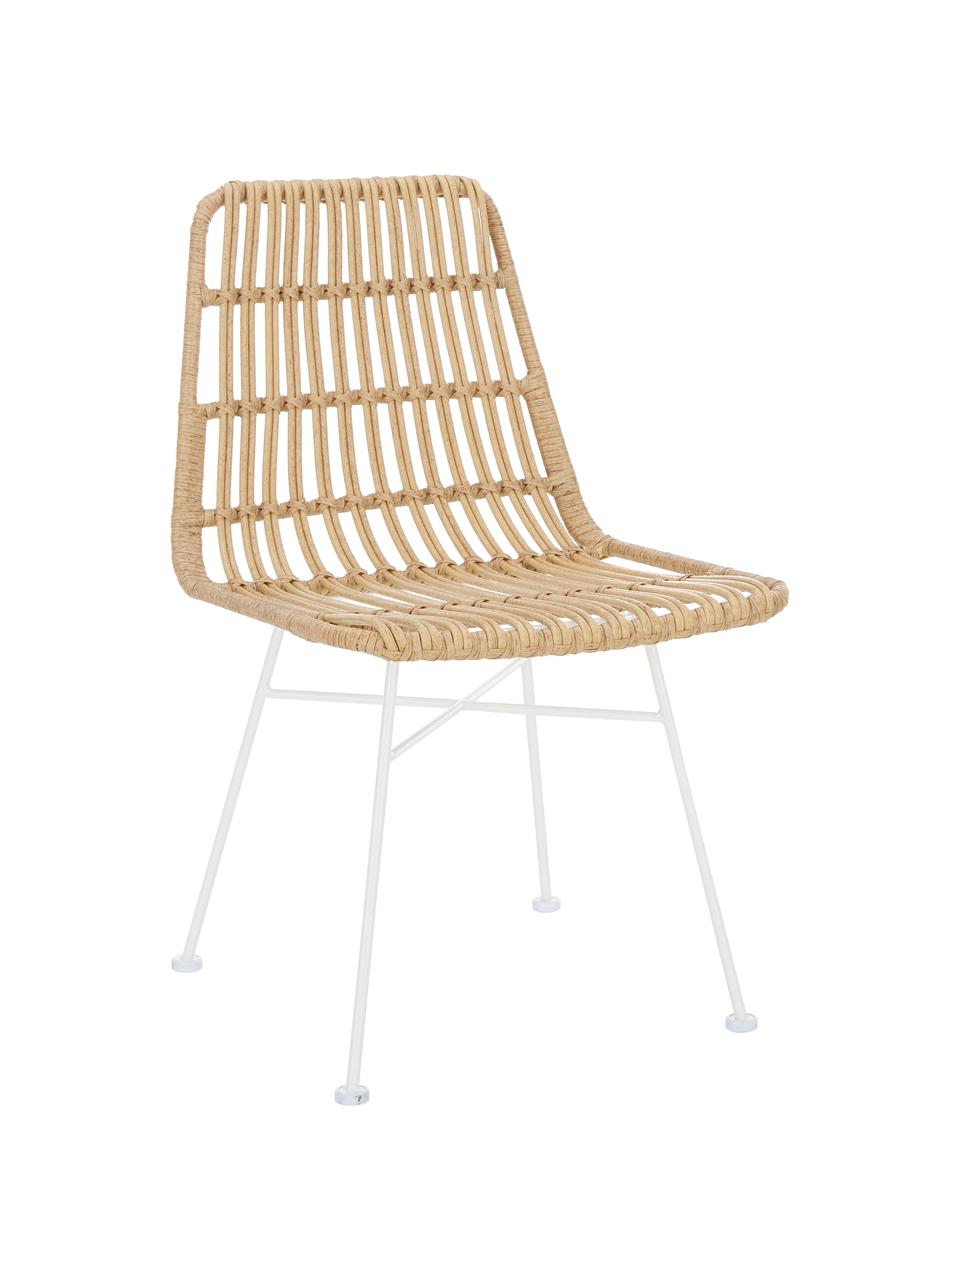 Polyrattan-Stühle Costa, 2 Stück, Sitzfläche: Polyethylen-Geflecht, Gestell: Metall, pulverbeschichtet, Hellbraun, Weiß, B 47 x T 61 cm